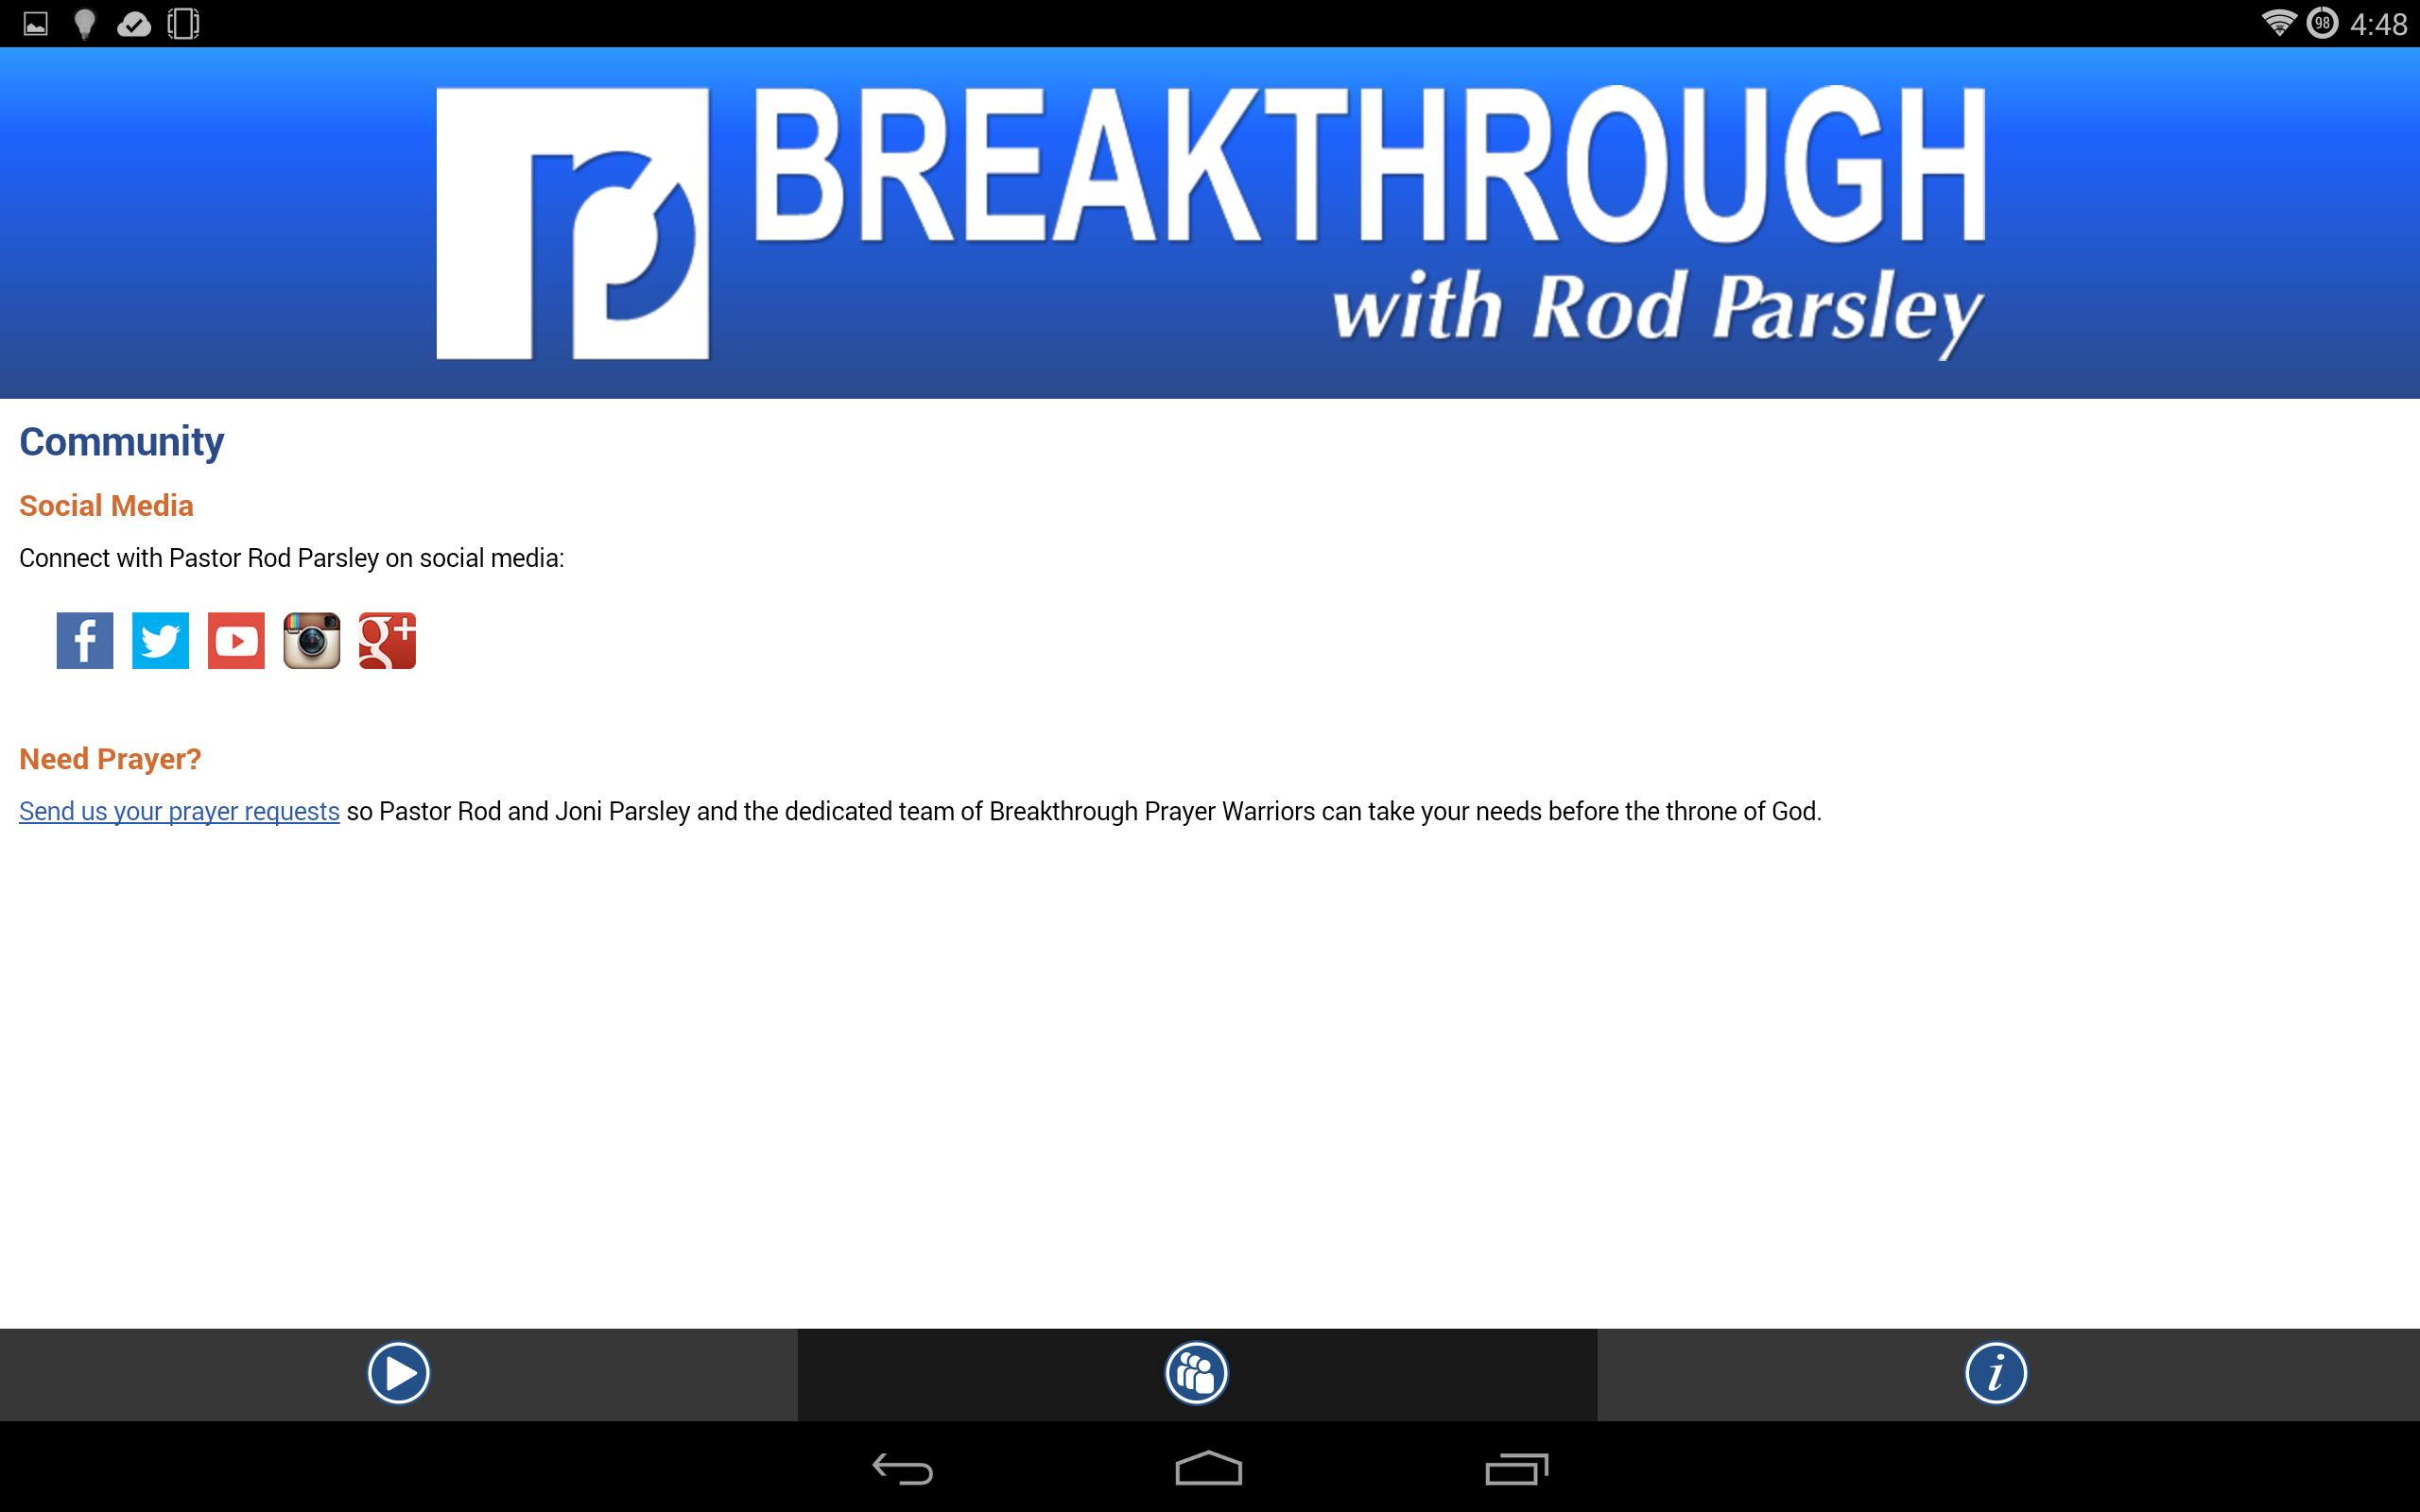 Breakthrough Intercessors Prayer Request